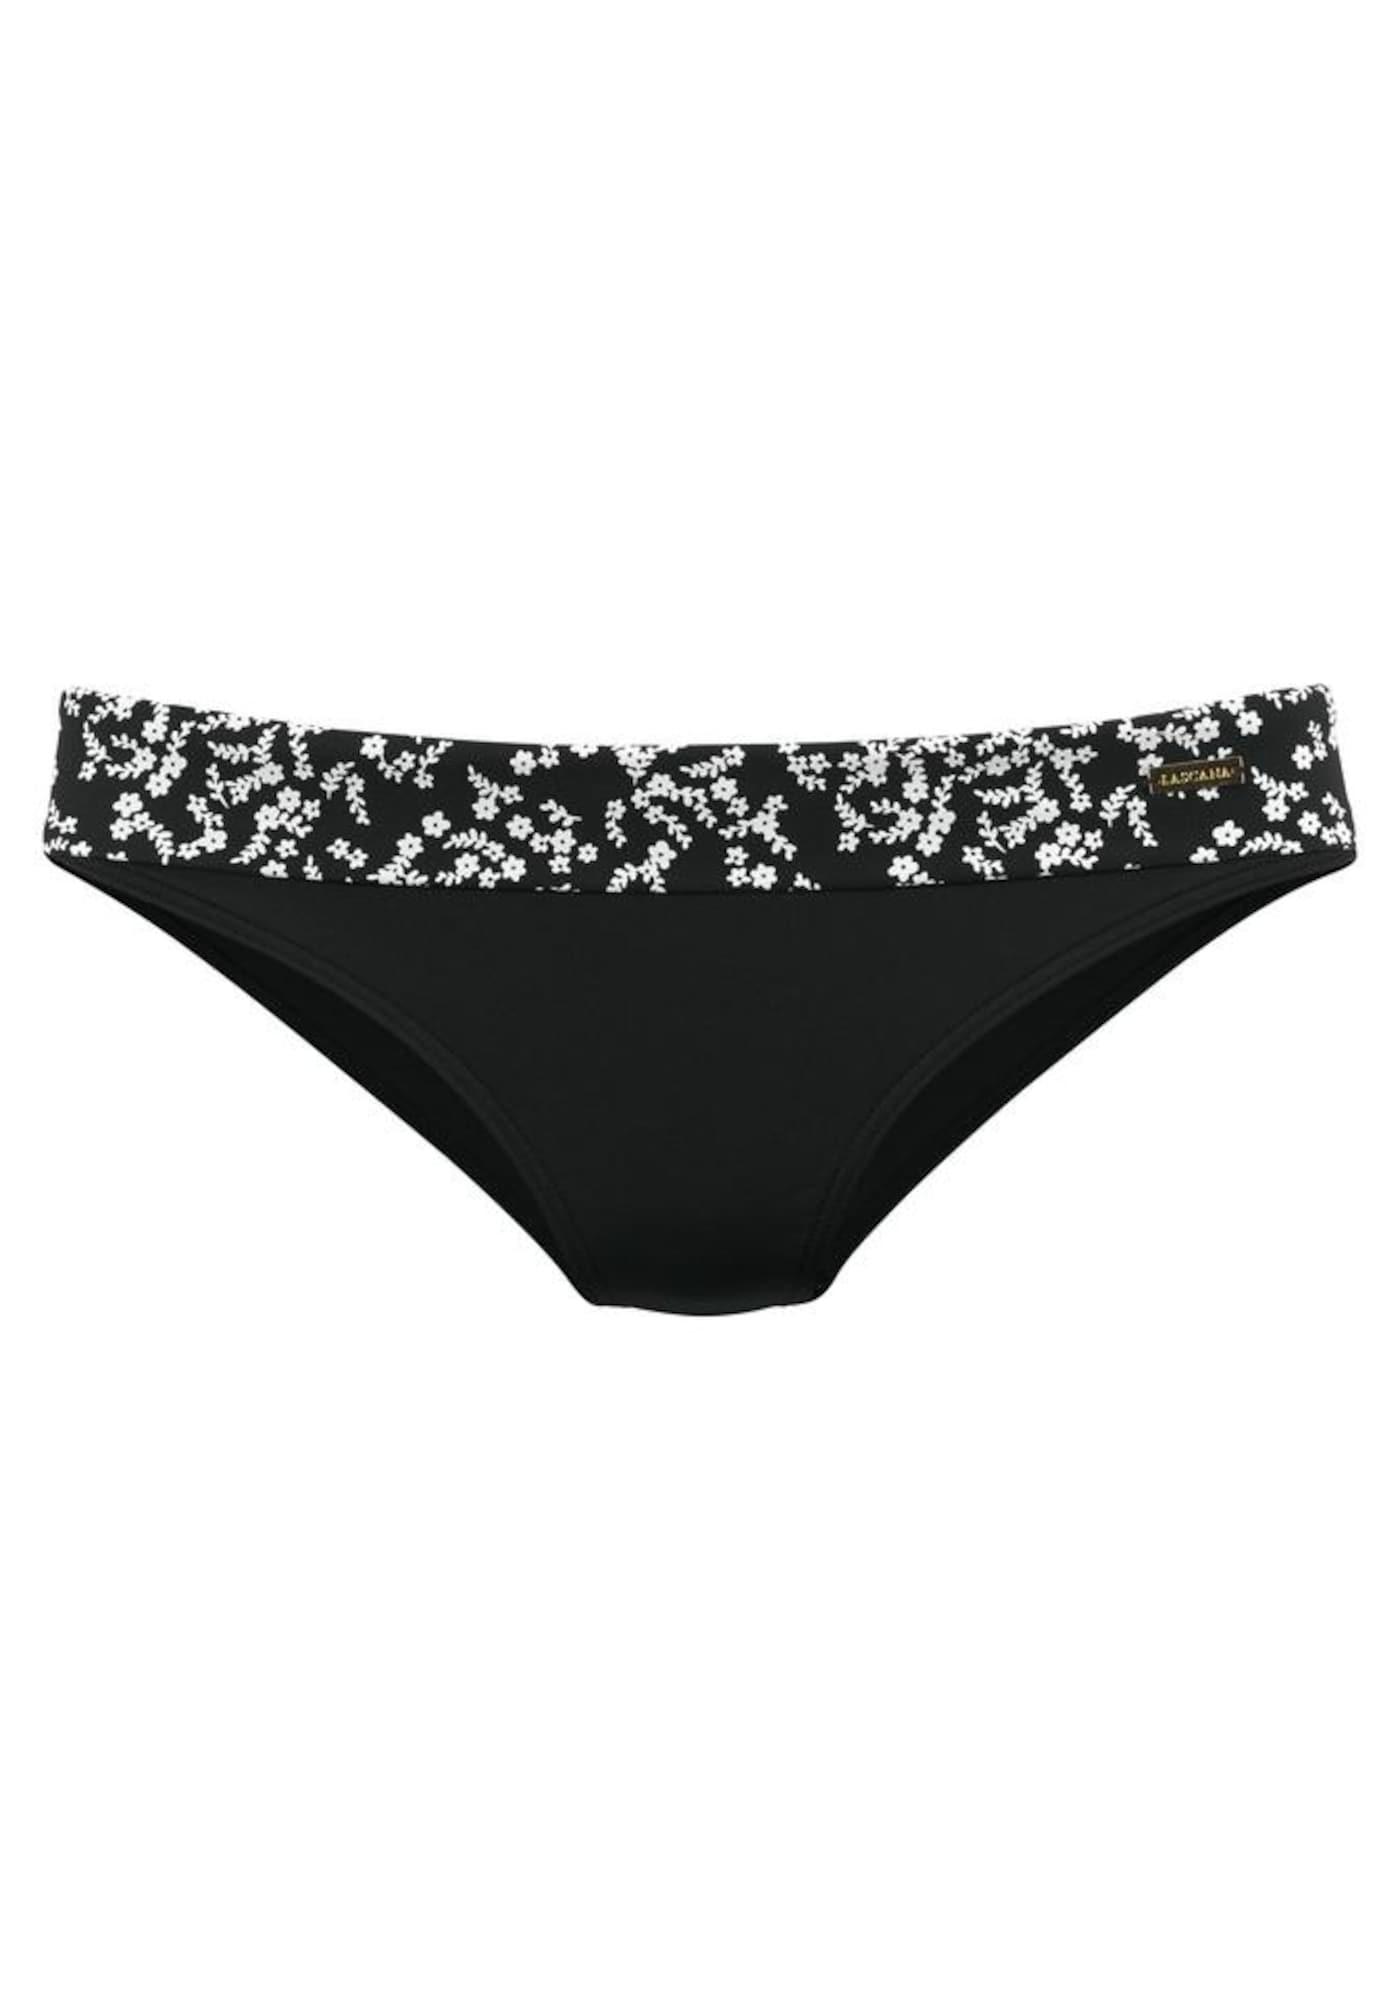 LASCANA Bas de bikini 'Meadow'  - Noir - Taille: 42 - female